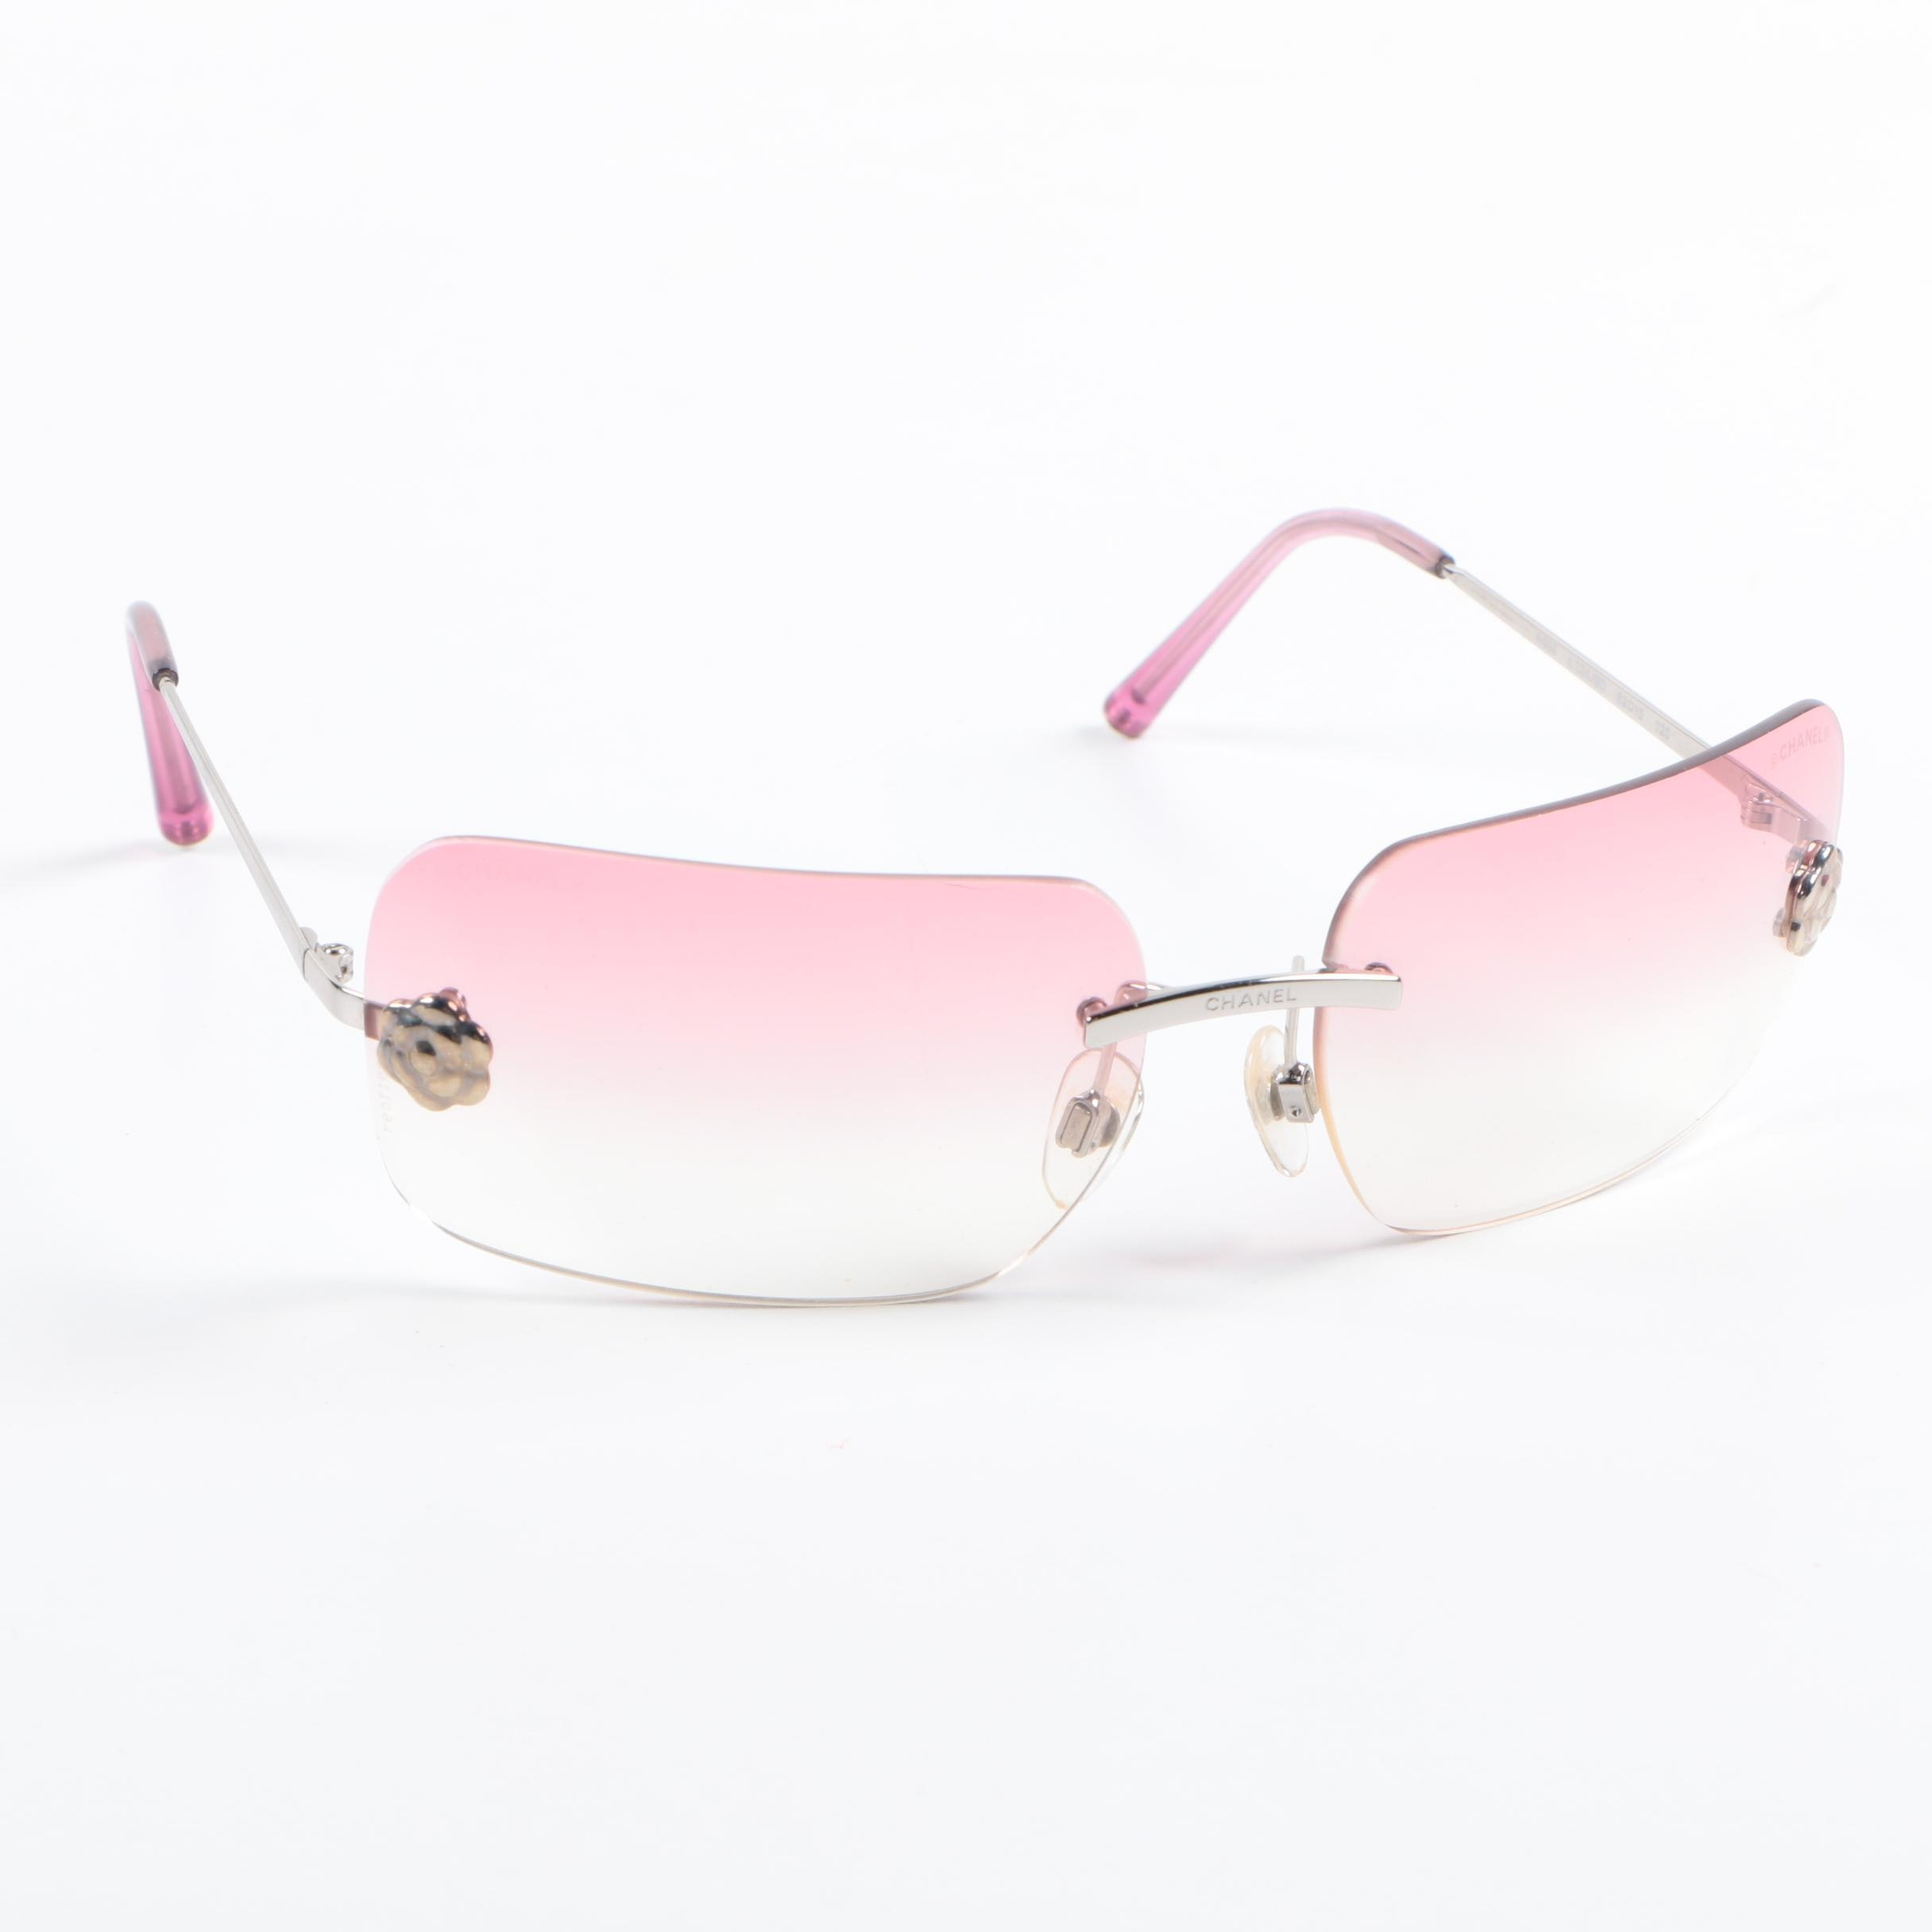 Vintage Chanel 4085 Camelia Flower Sunglasses